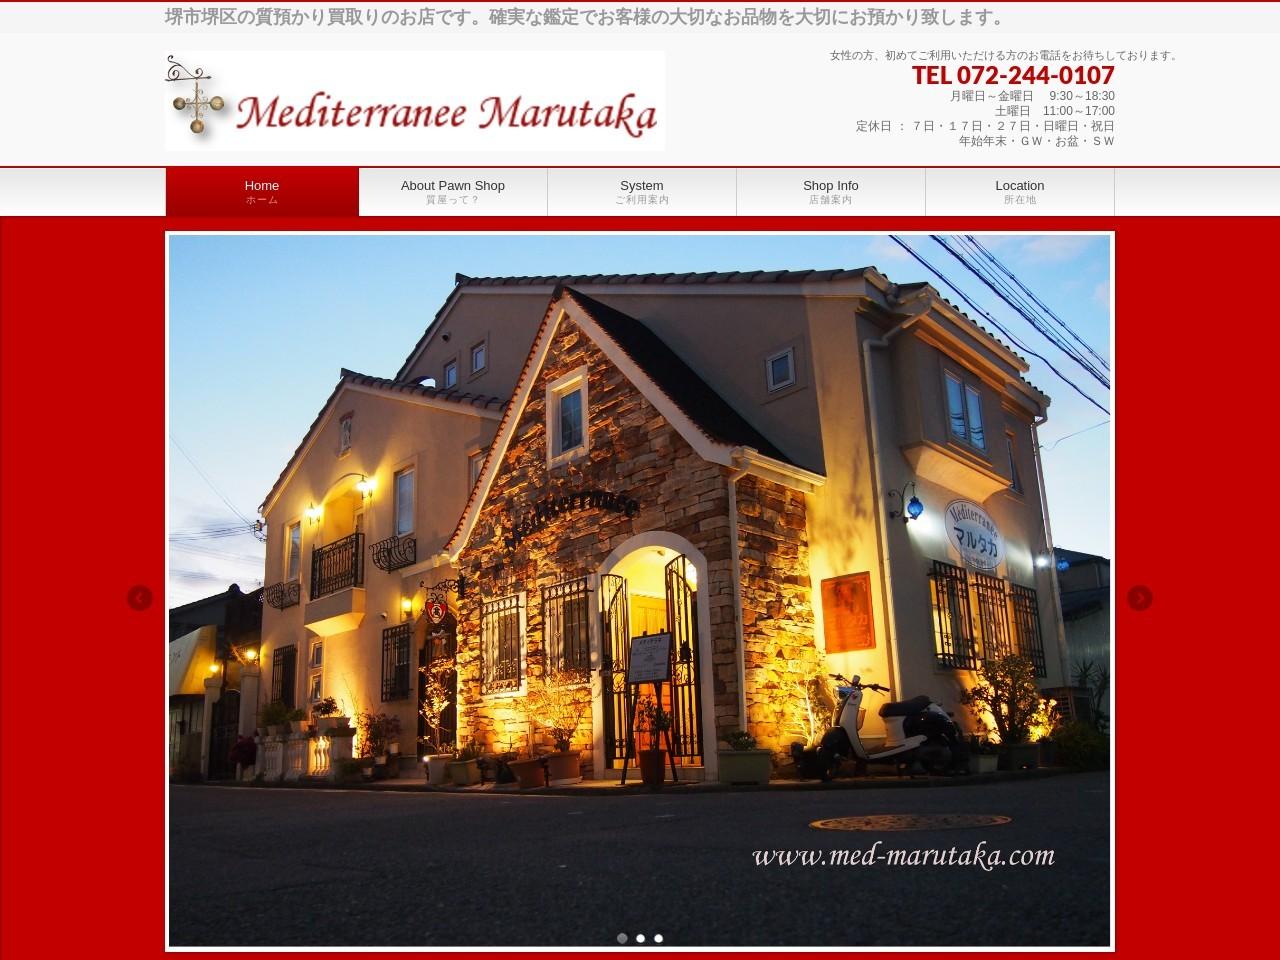 堺市質屋 【 Mediterranee Marutaka 】 丸高質舗